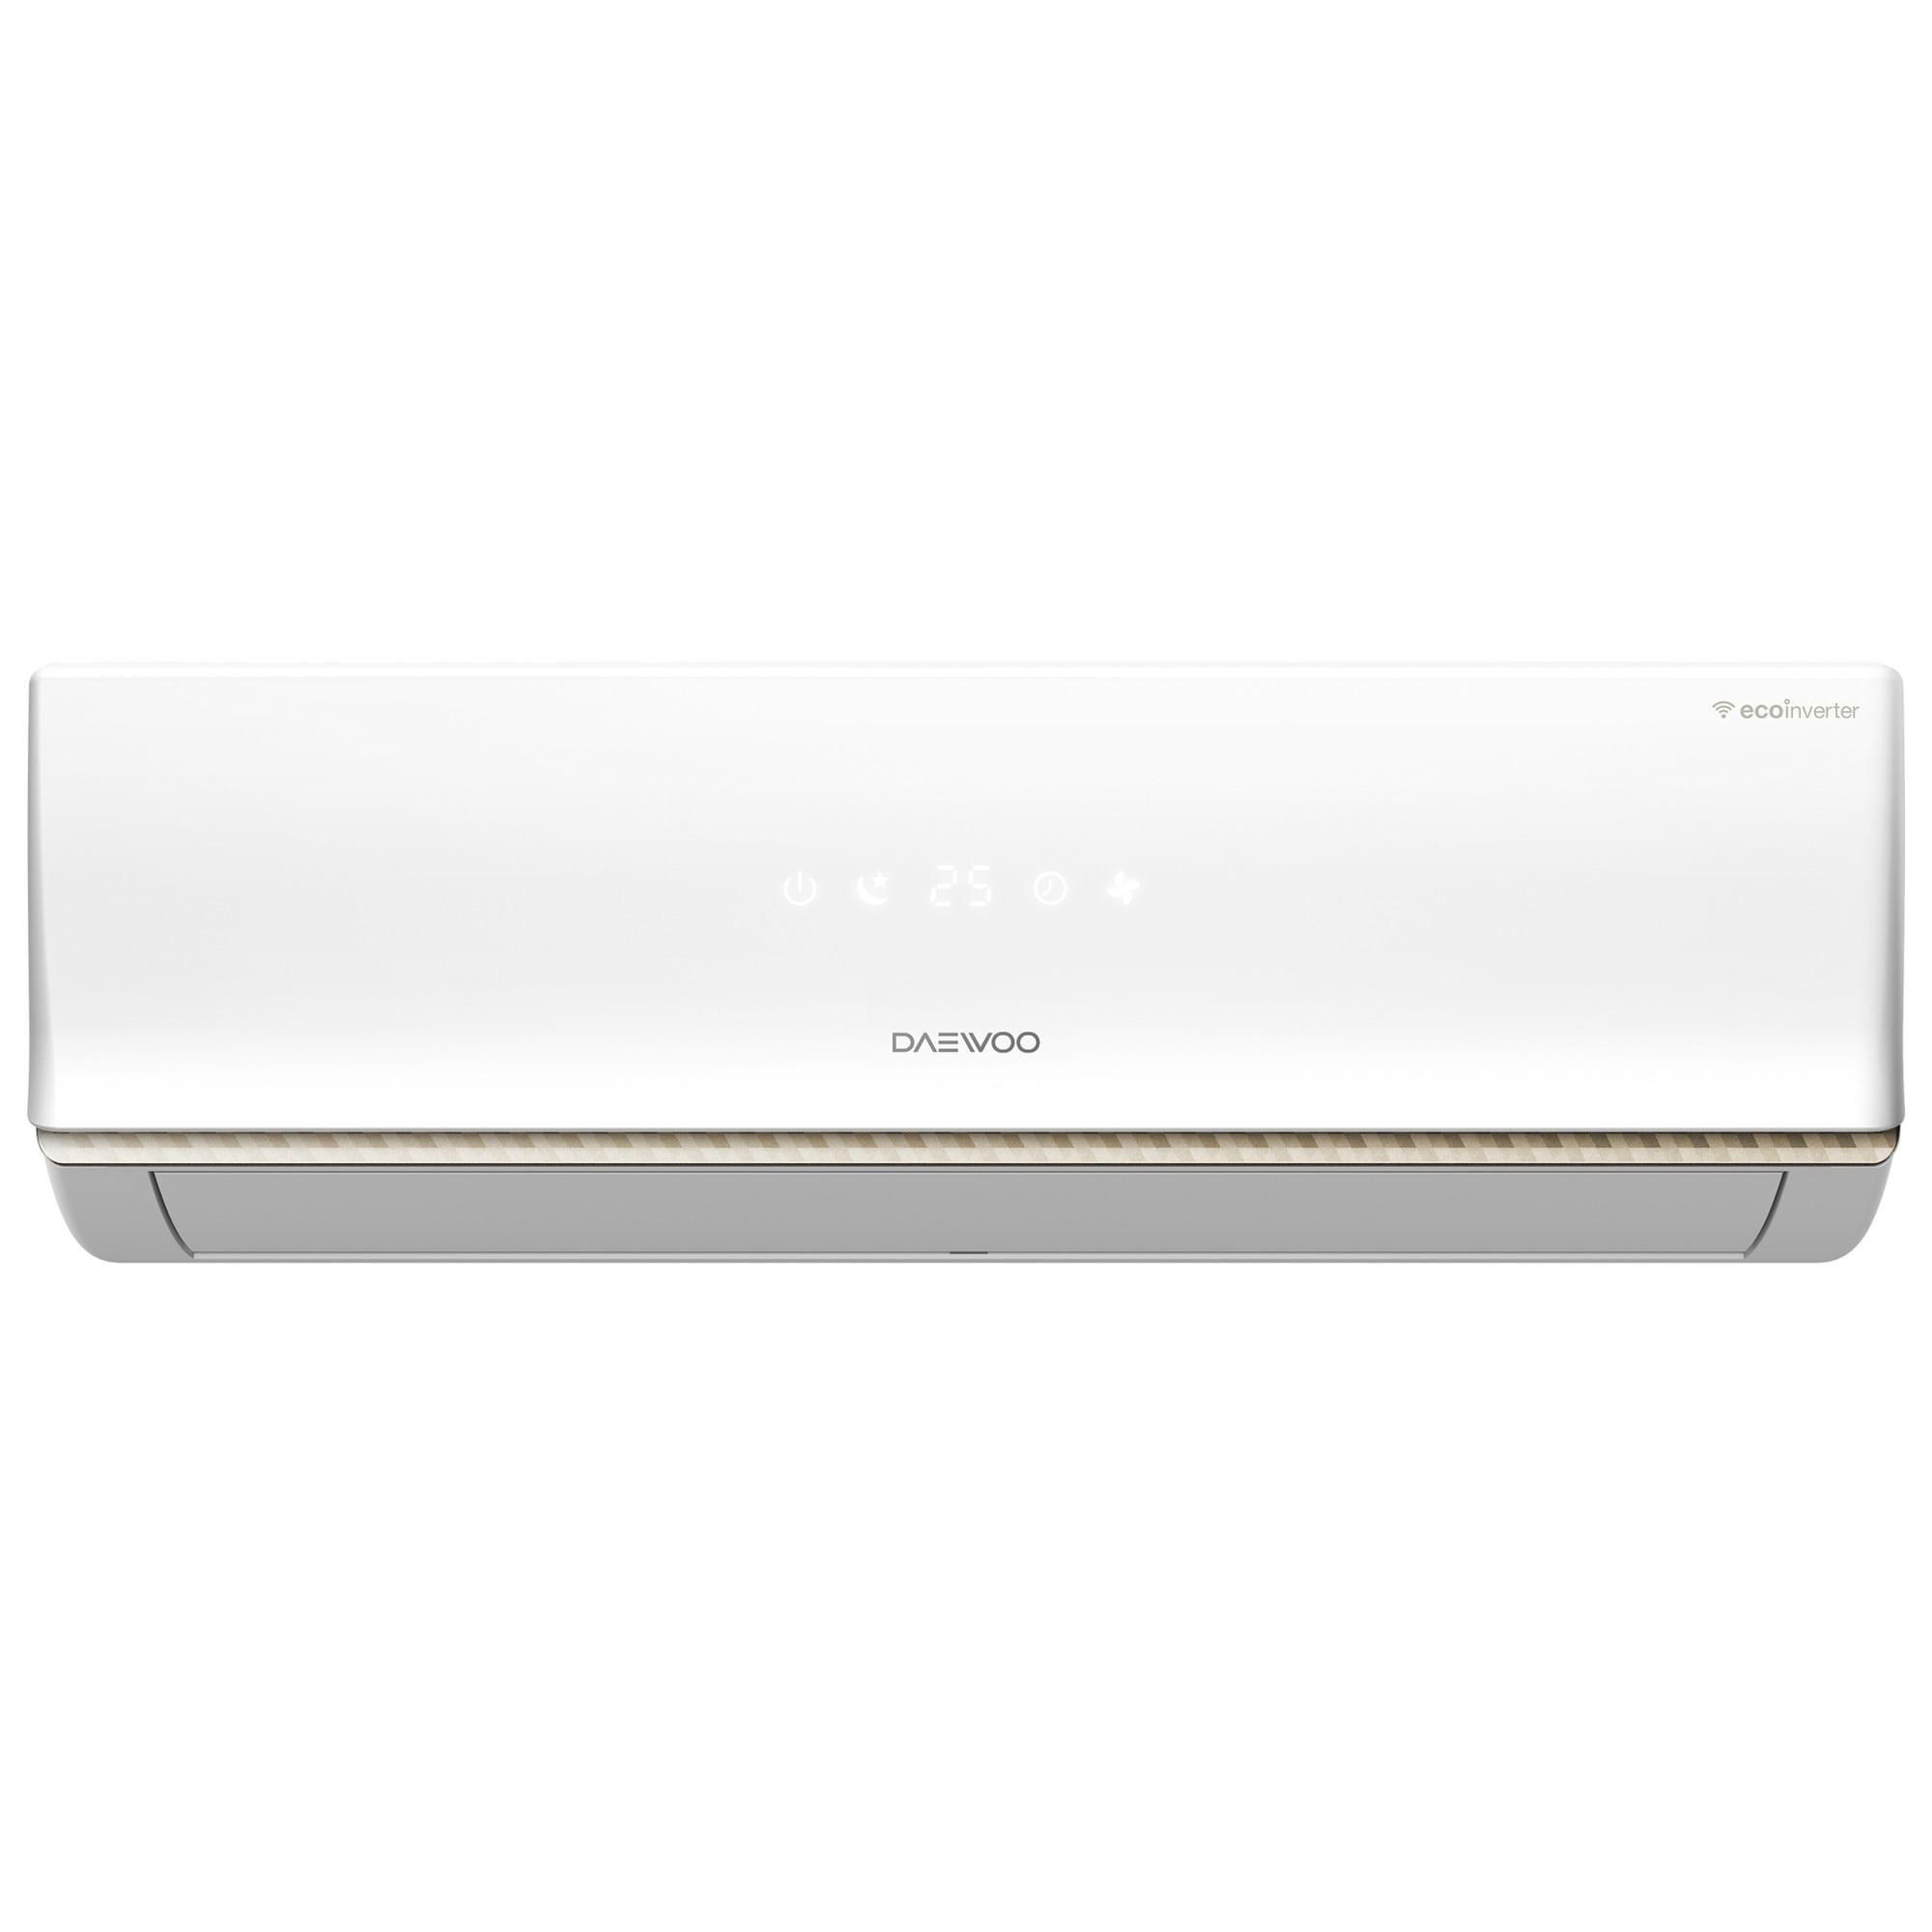 Fotografie Aparat de aer conditionat Daewoo 18000 BTU Wi-Fi, Clasa A++, kit instalare inclus, 4 directii de ventilare, DSB-H1802JLH-VKW, Alb